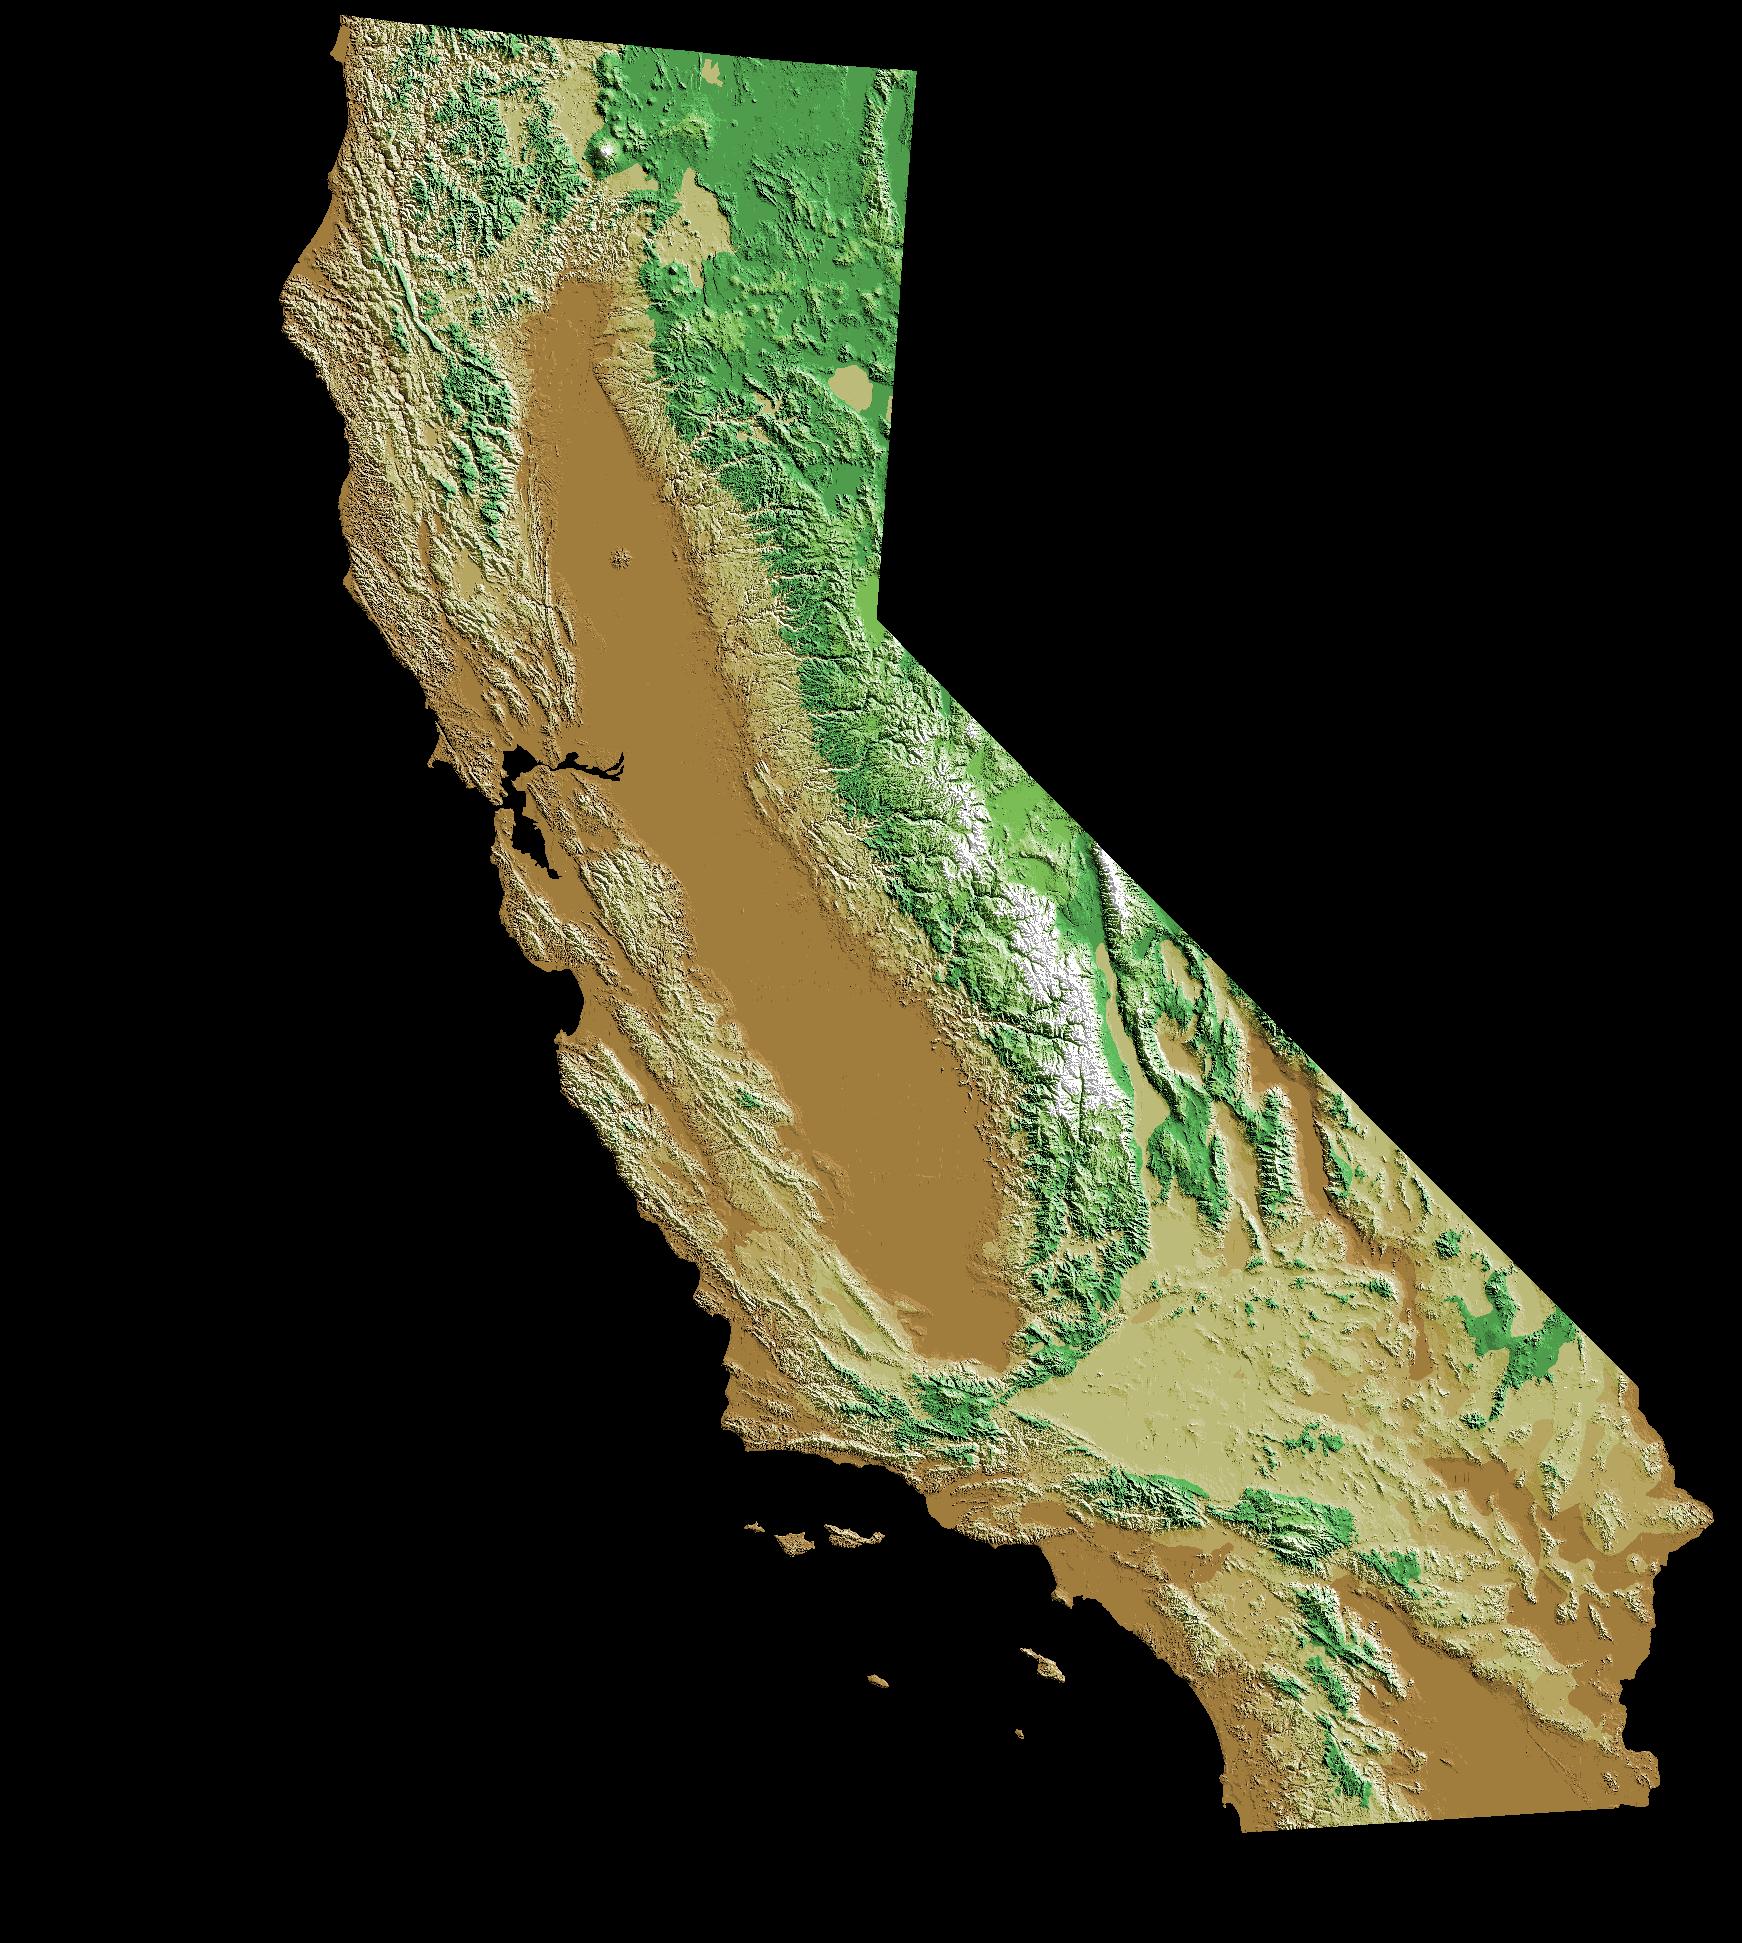 Digital topographic elevations map of California Digital